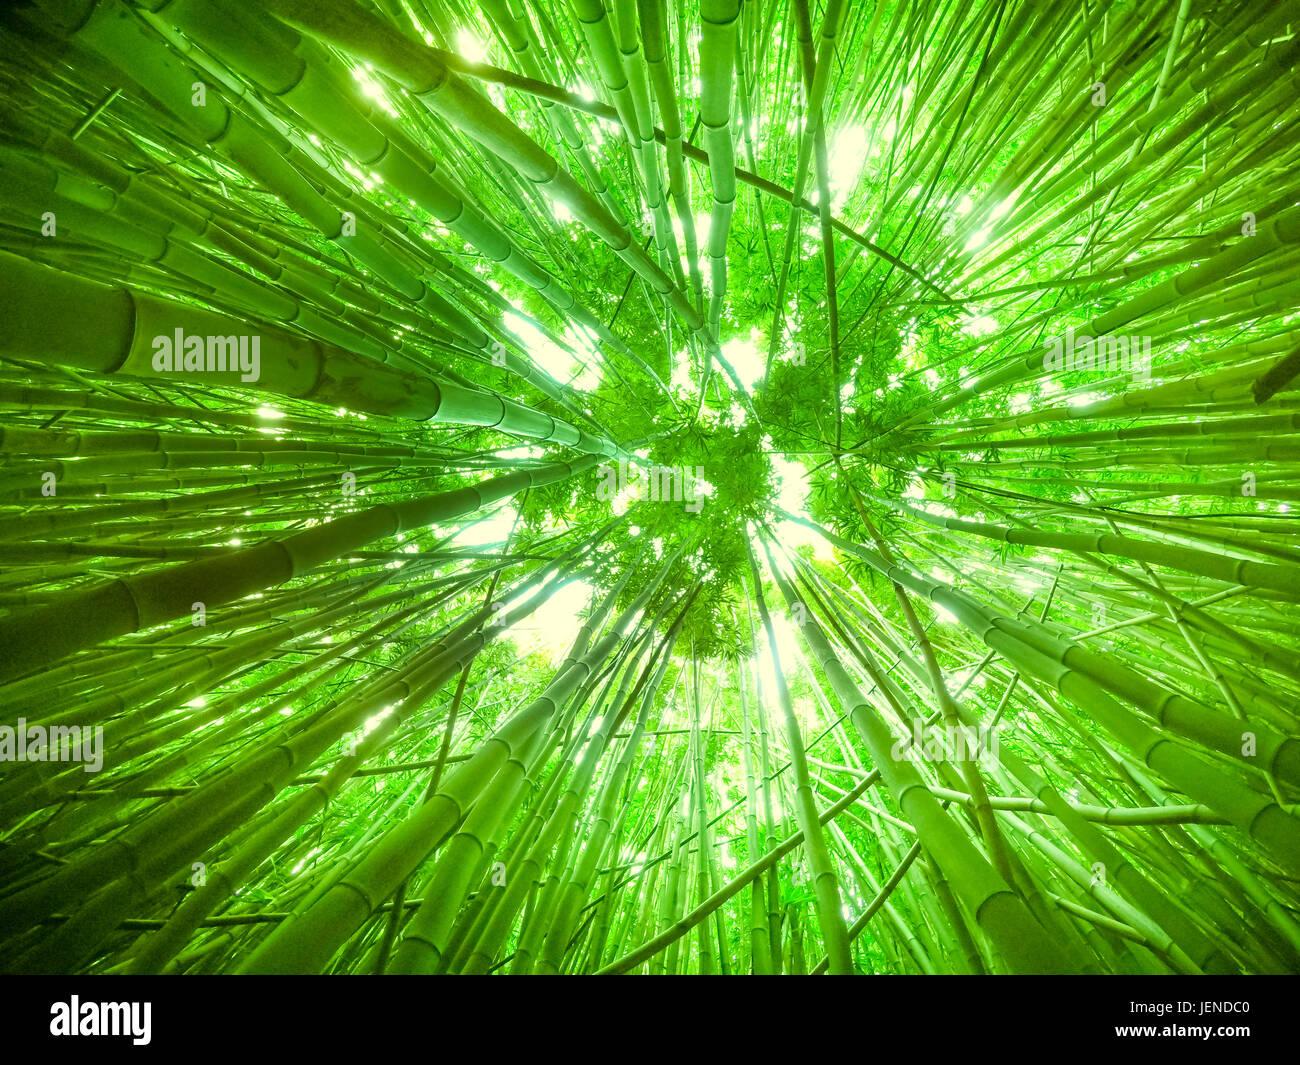 Low angle view of a bamboo canopy, Maui, Hawaii, America, USA Stock Photo